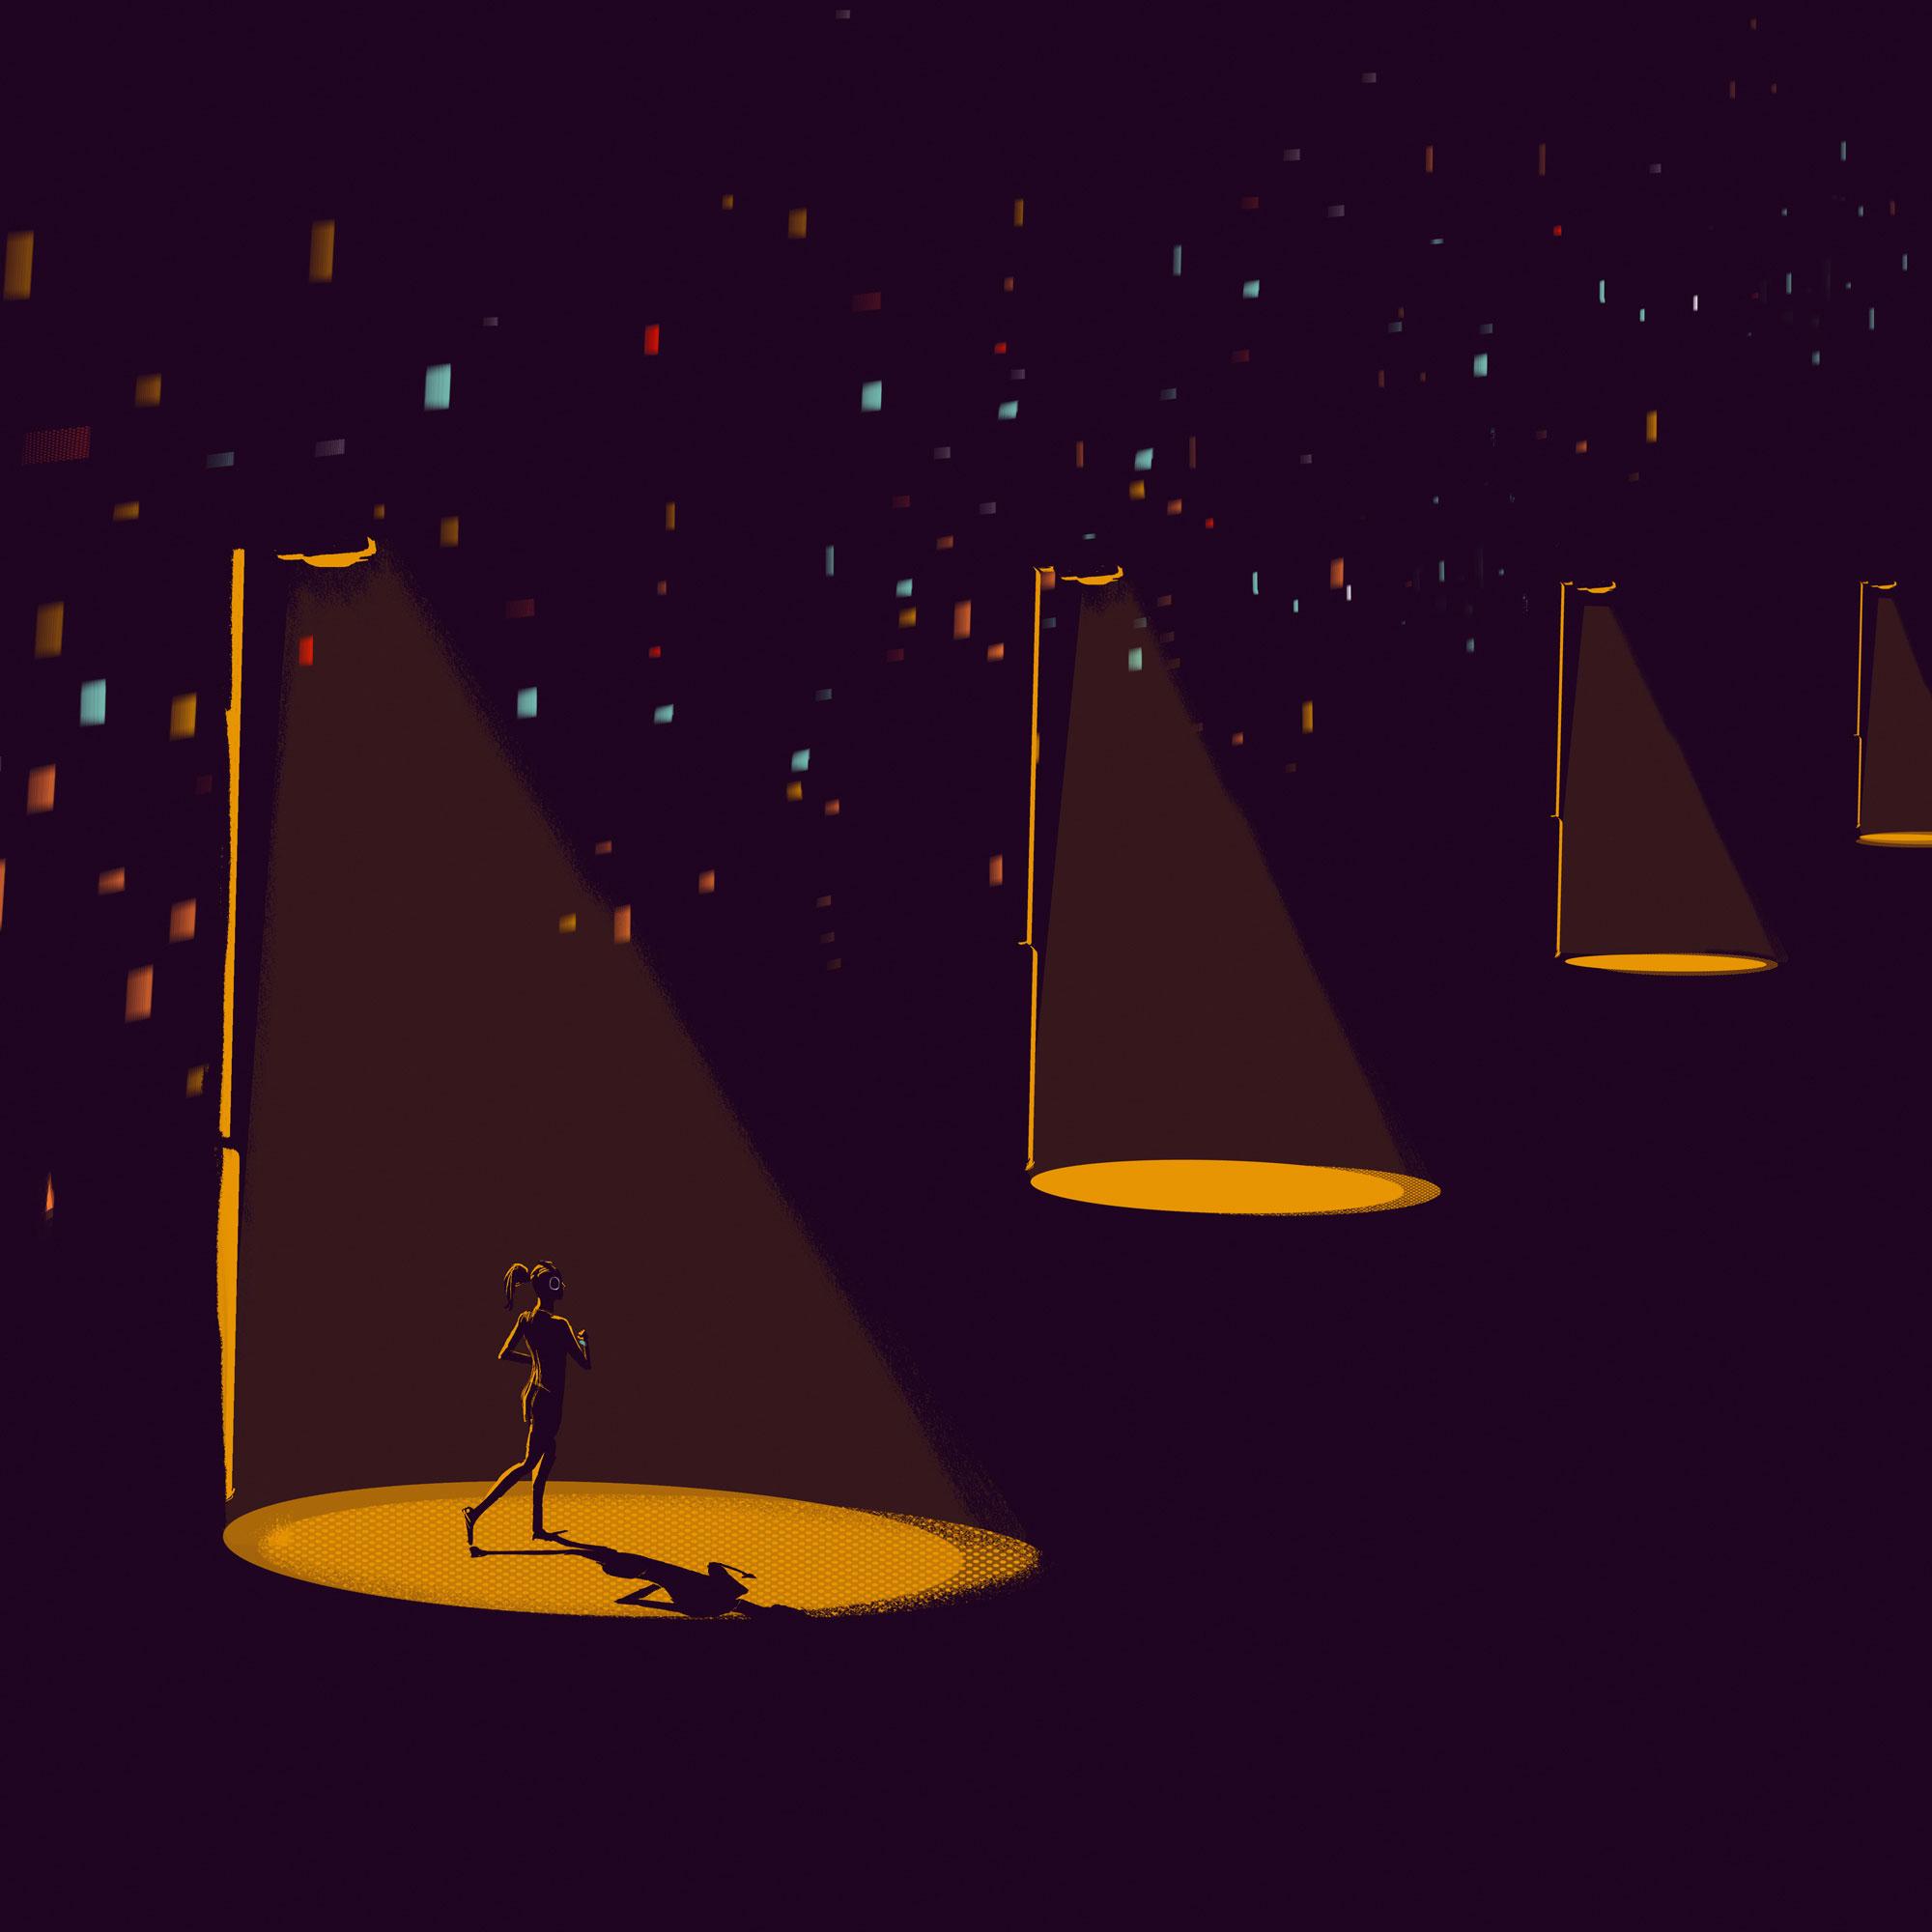 nightrunning7.jpg